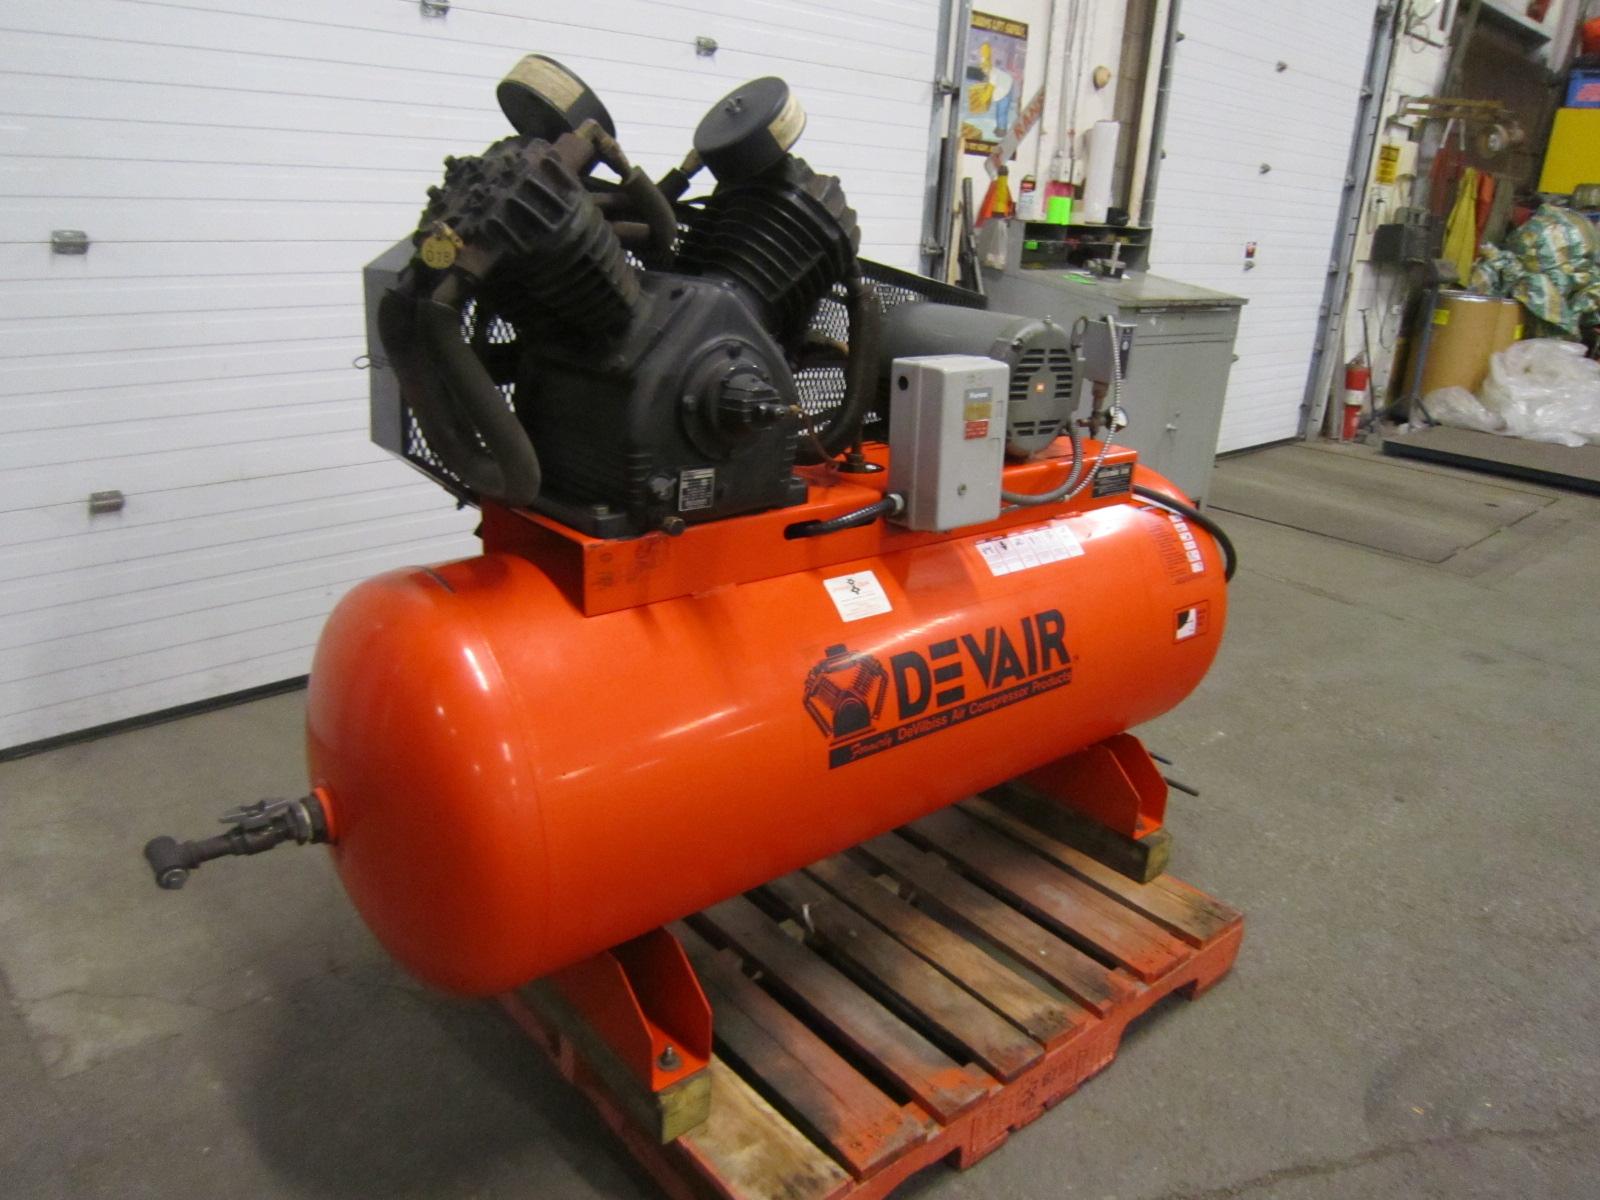 Devair Devilbiss 10HP Air Compressor model 447